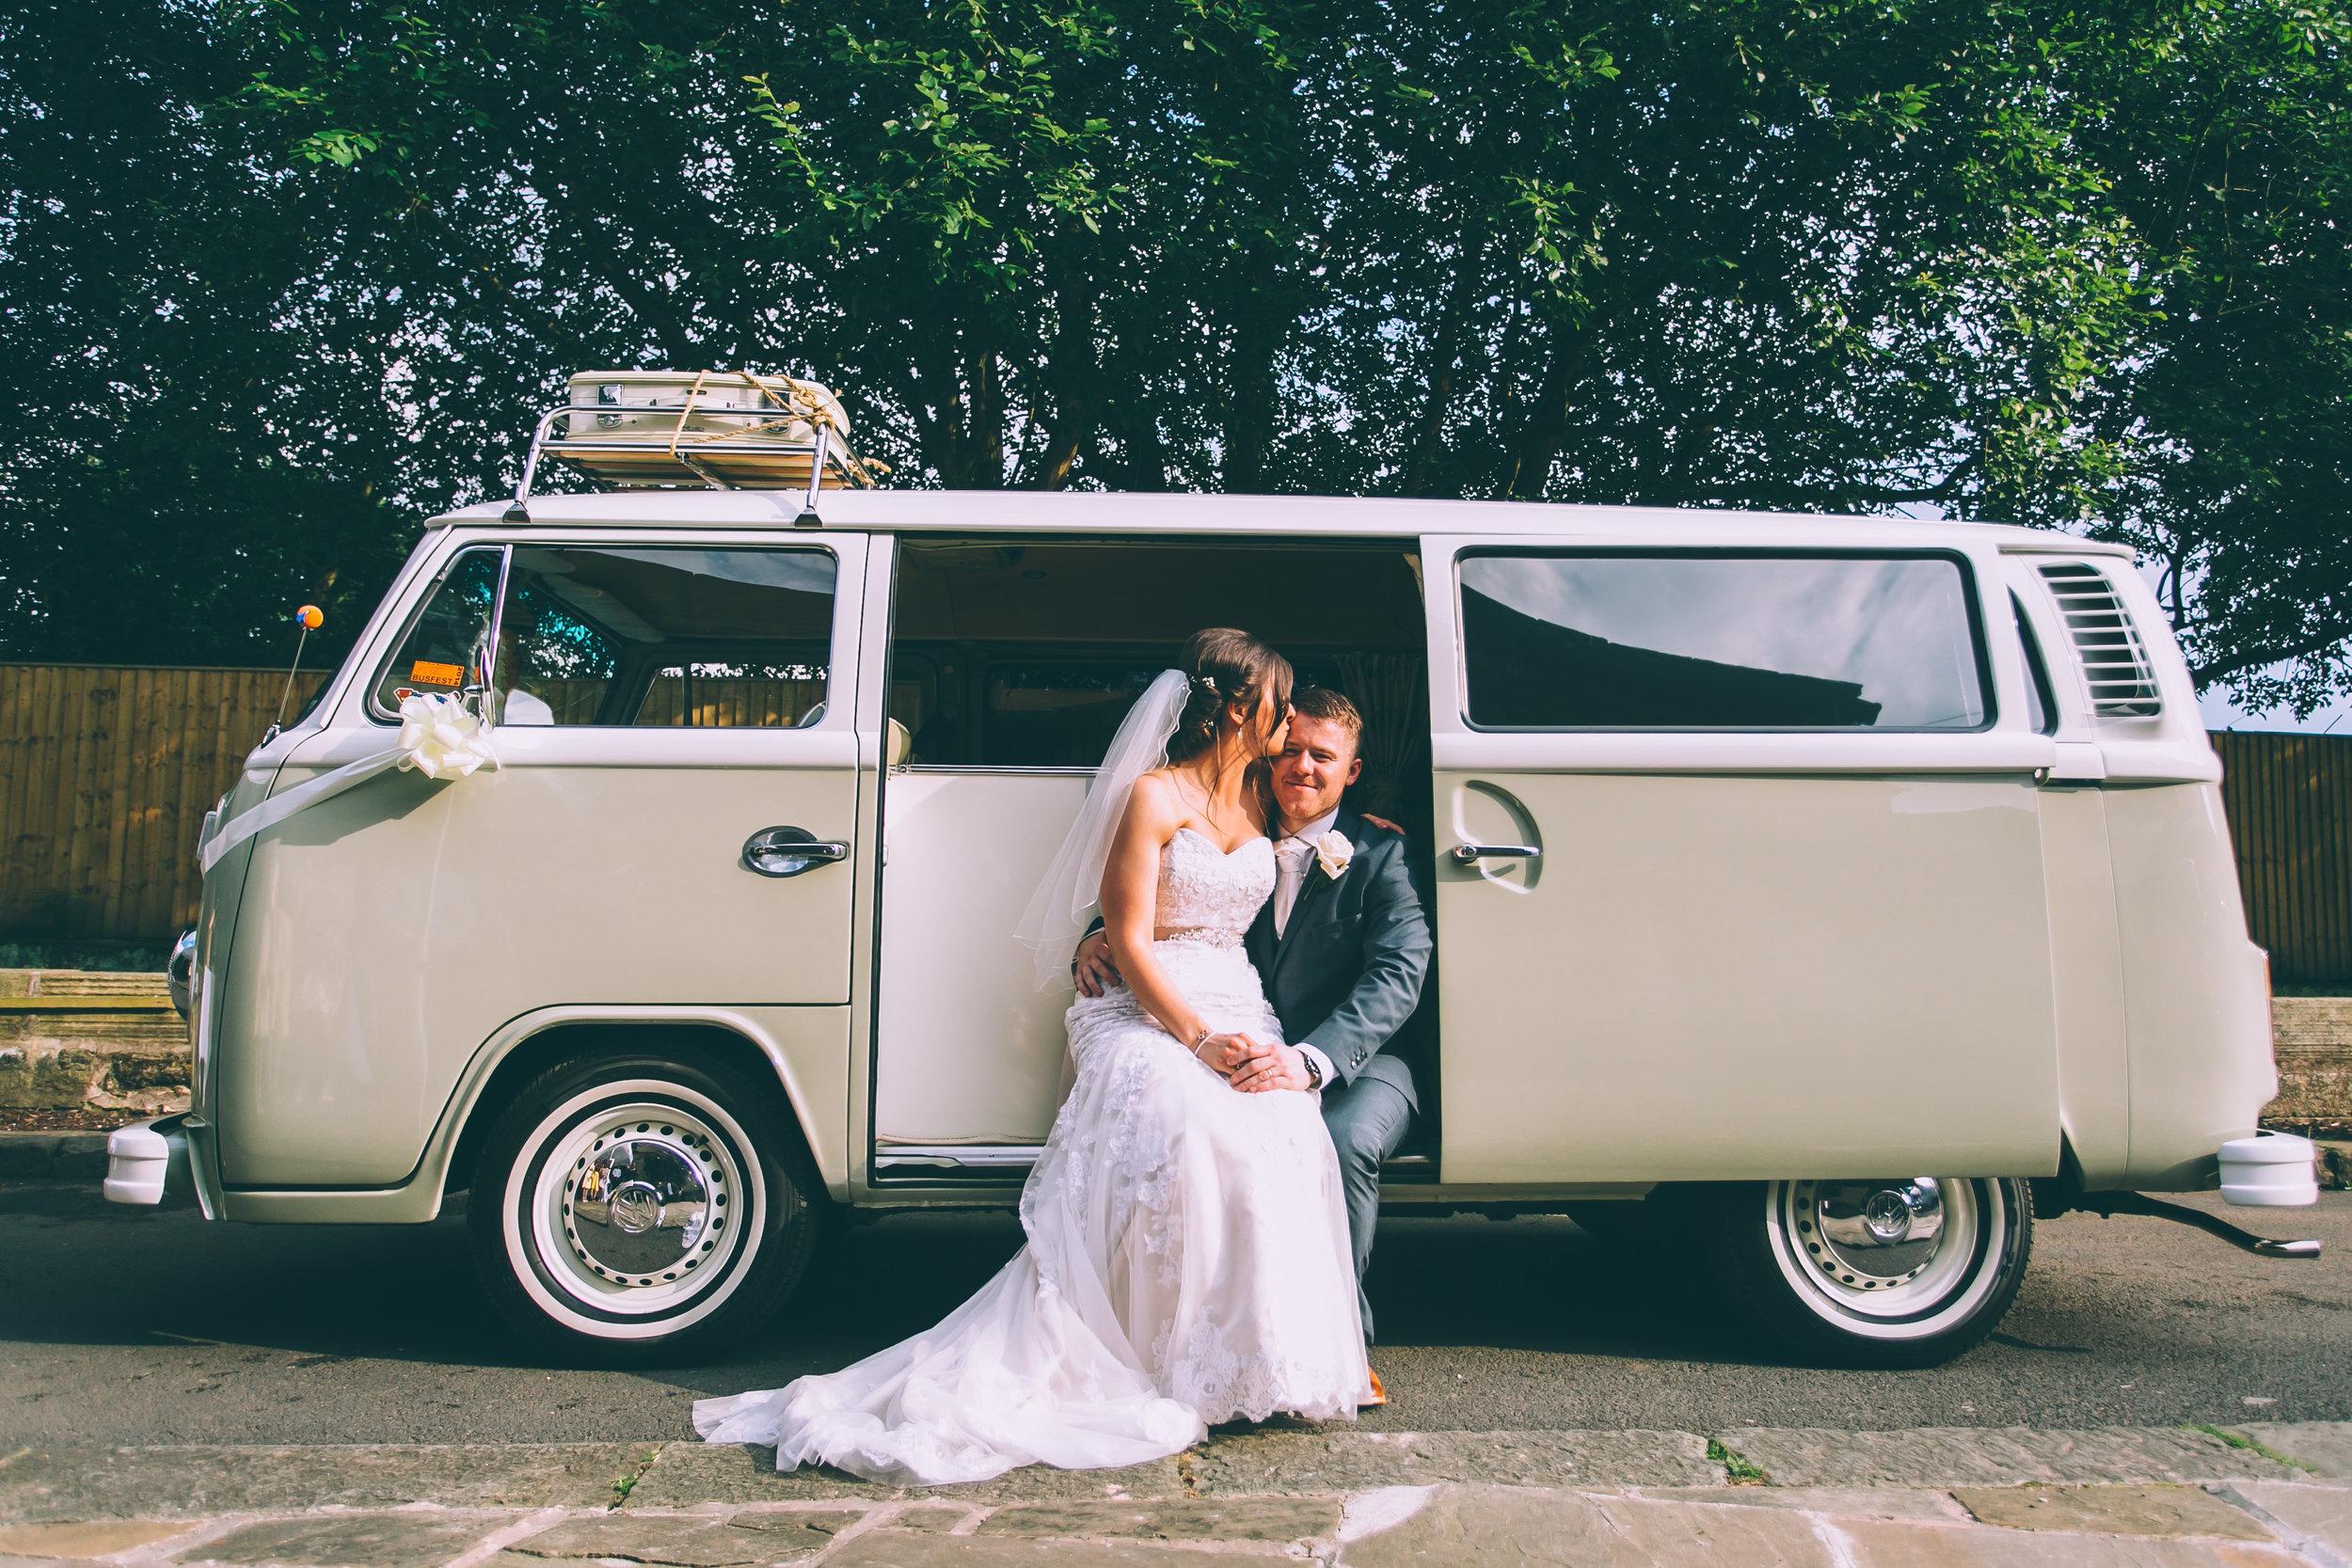 rebecca&dan_wedding_22.08.15_tombiddle_tb334.jpg